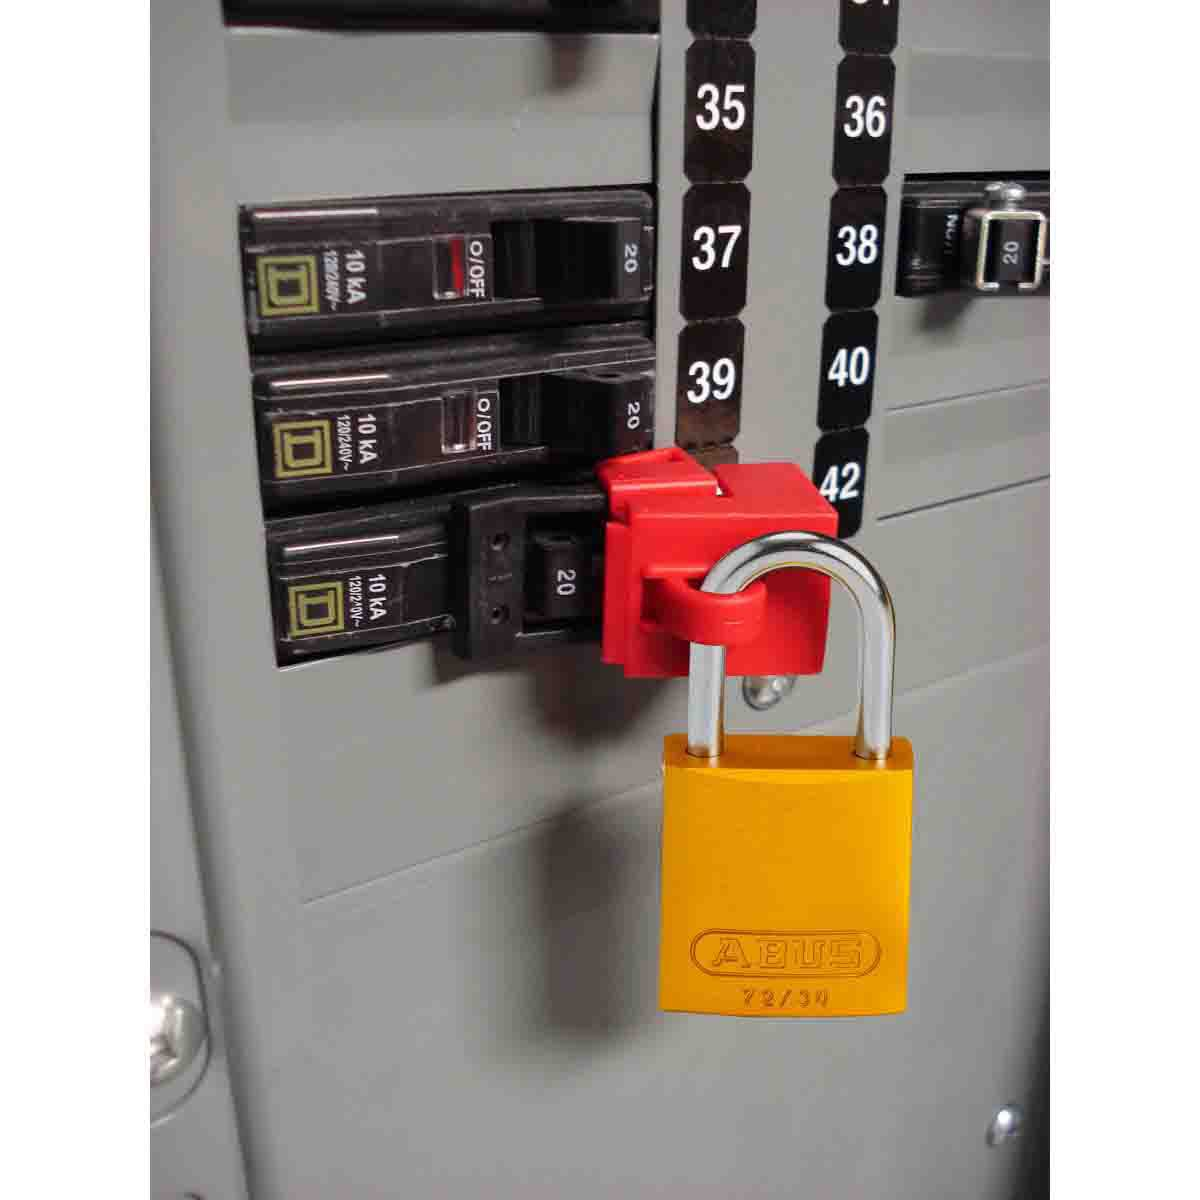 Bloqueio Disjuntor Monopolar Brady 480/600 Volts Universal 65966